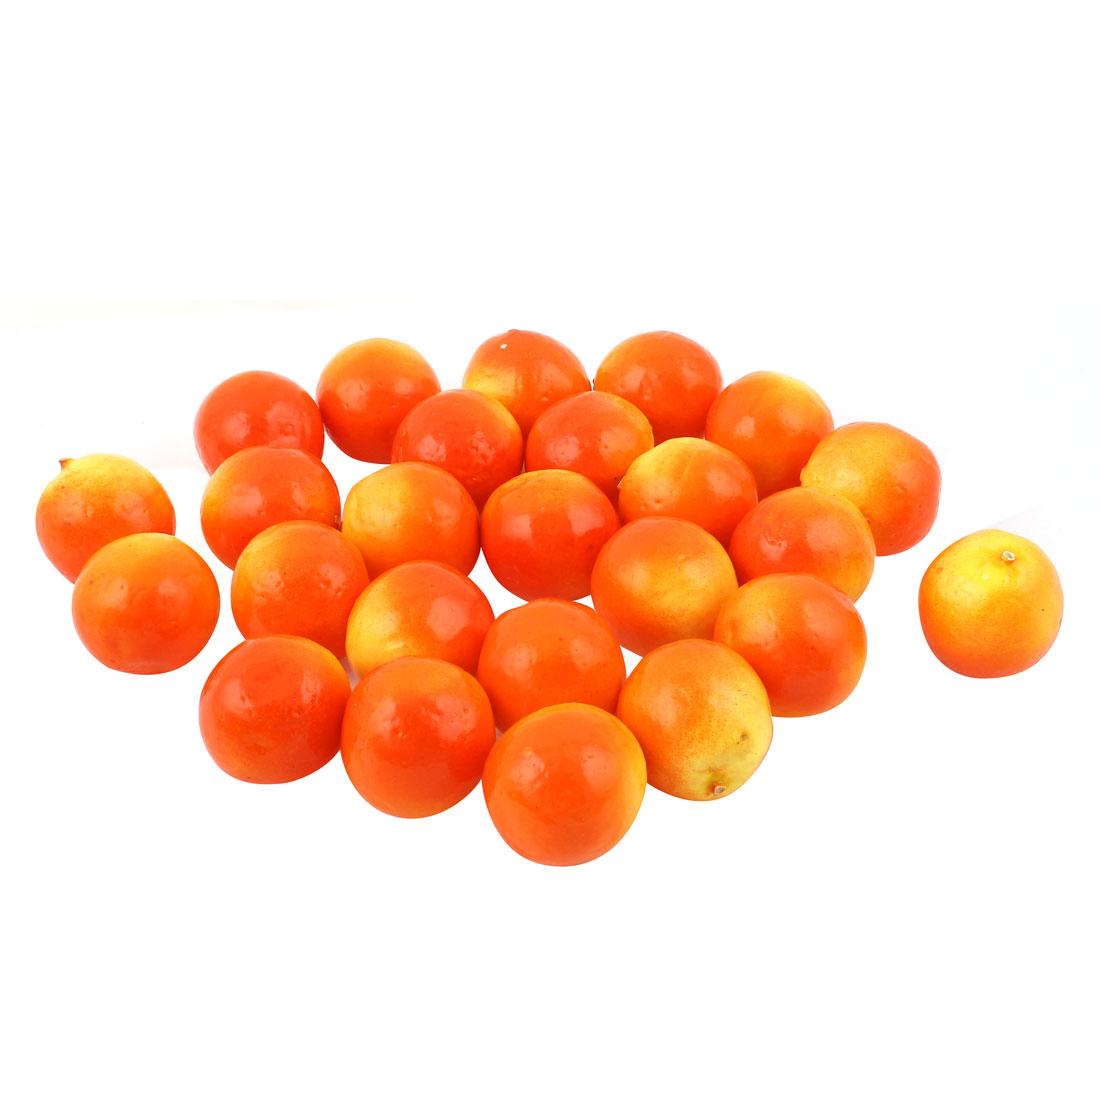 25 Pcs Mini Artificial Fake Pomegranate Kitchen Table Wedding Party Fruit Decor